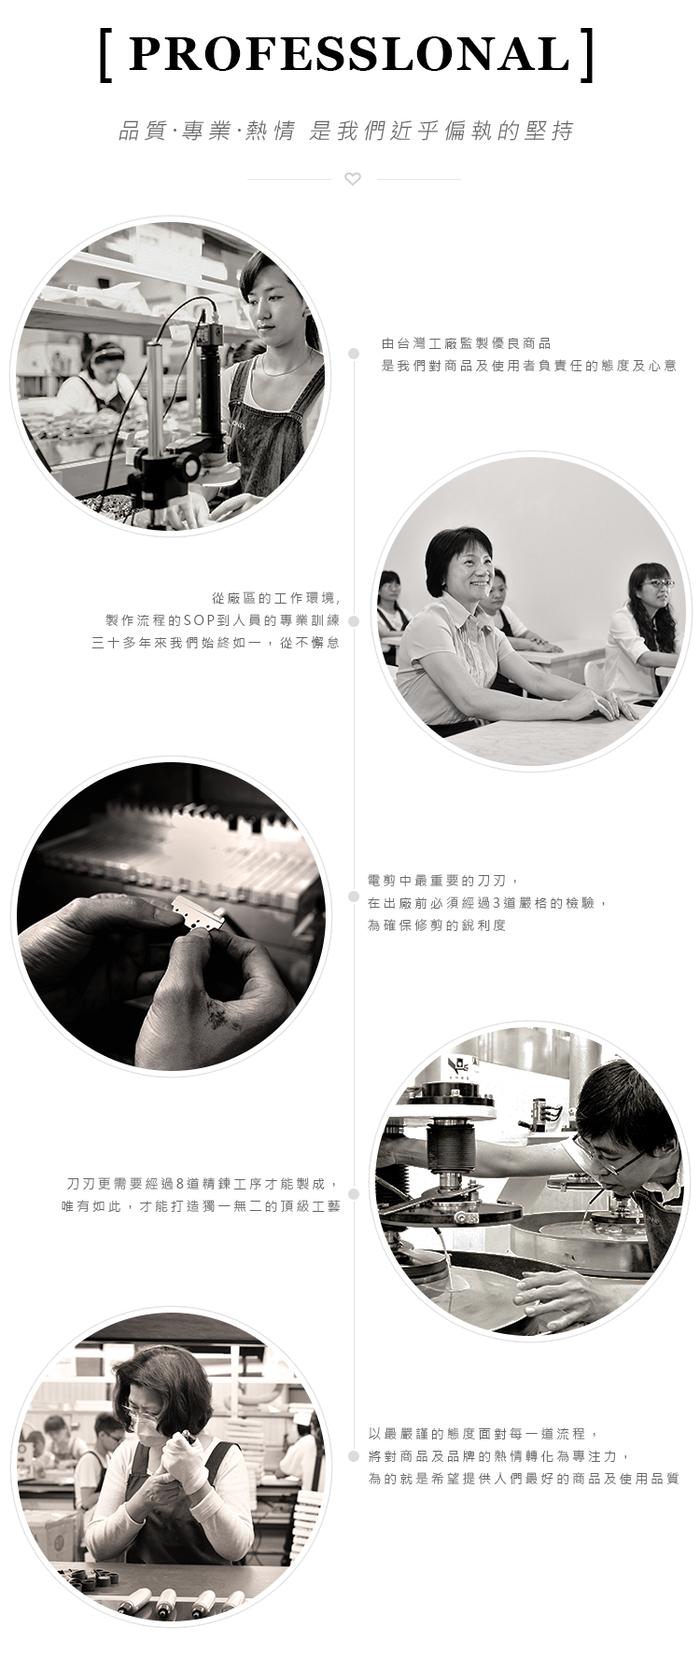 奧本 URBANER|水洗式電動鼻毛刀 MB-041